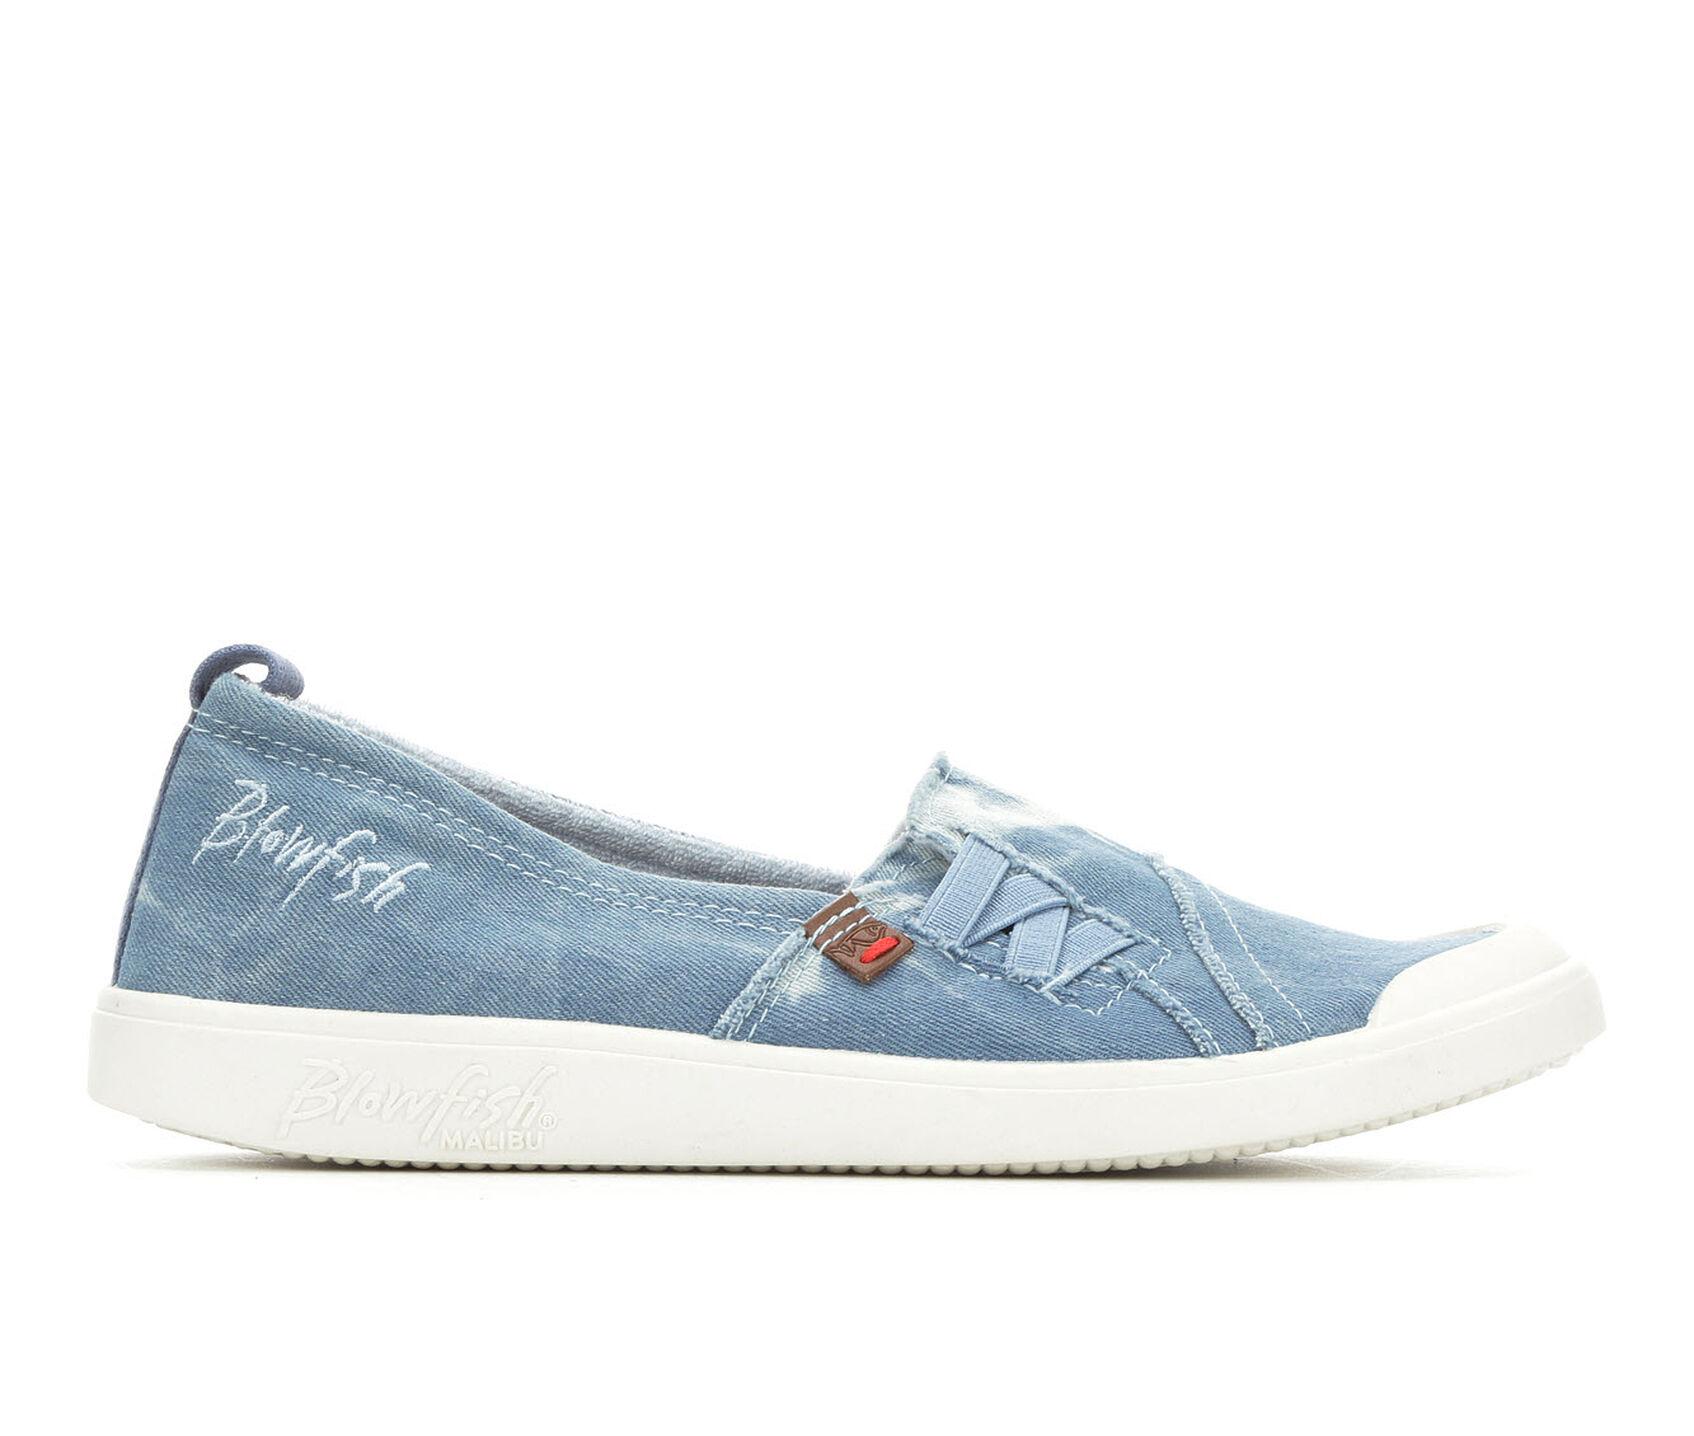 1dab27bd25479 Women's Blowfish Malibu Venus Sneakers